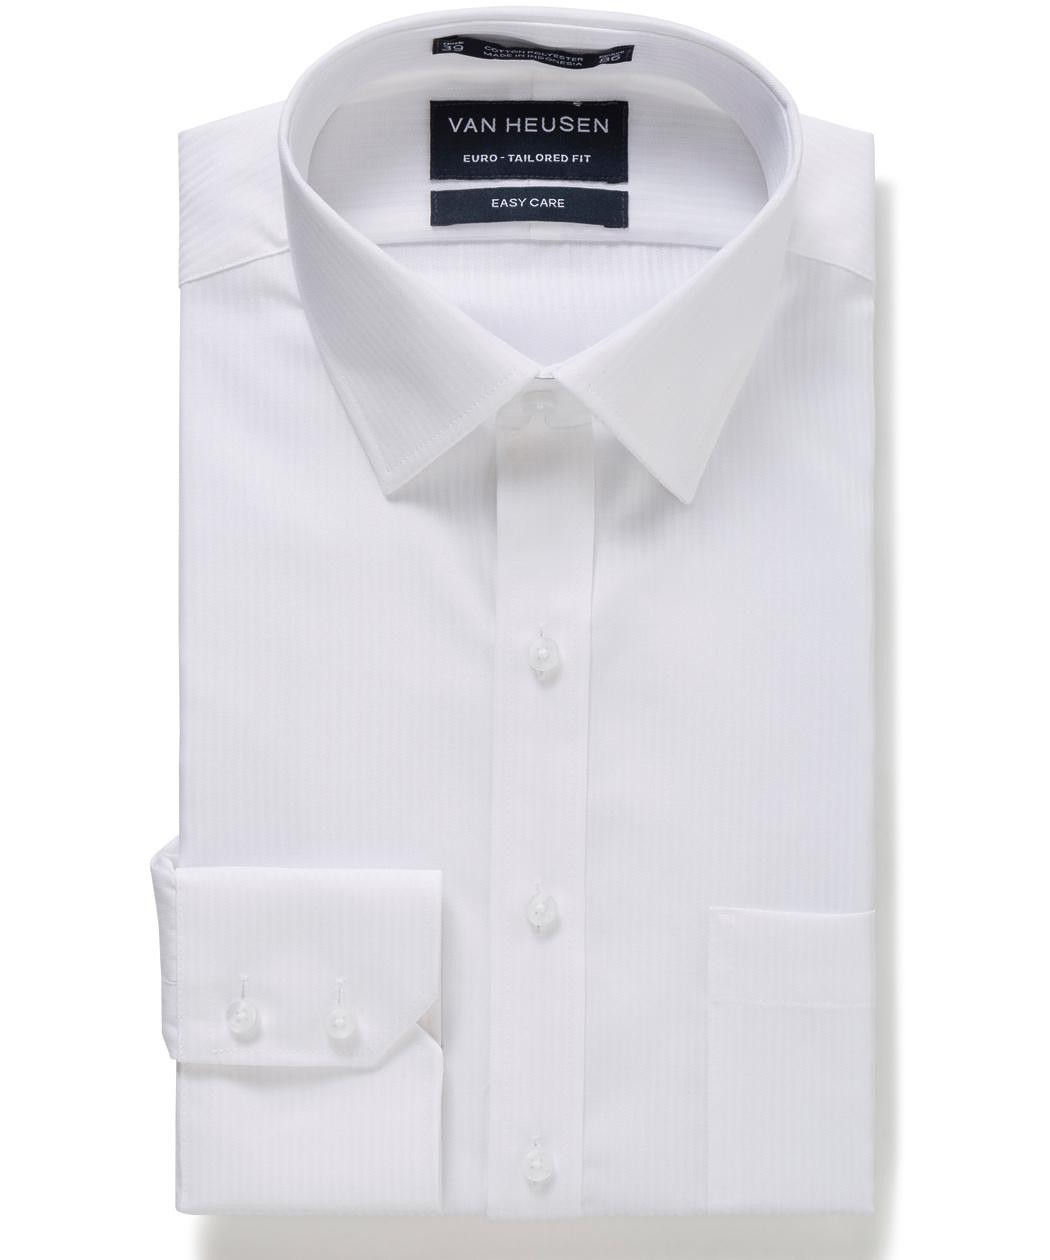 a1e48df967b Van Heusen. Euro Tailored Fit Shirt Self Stripe